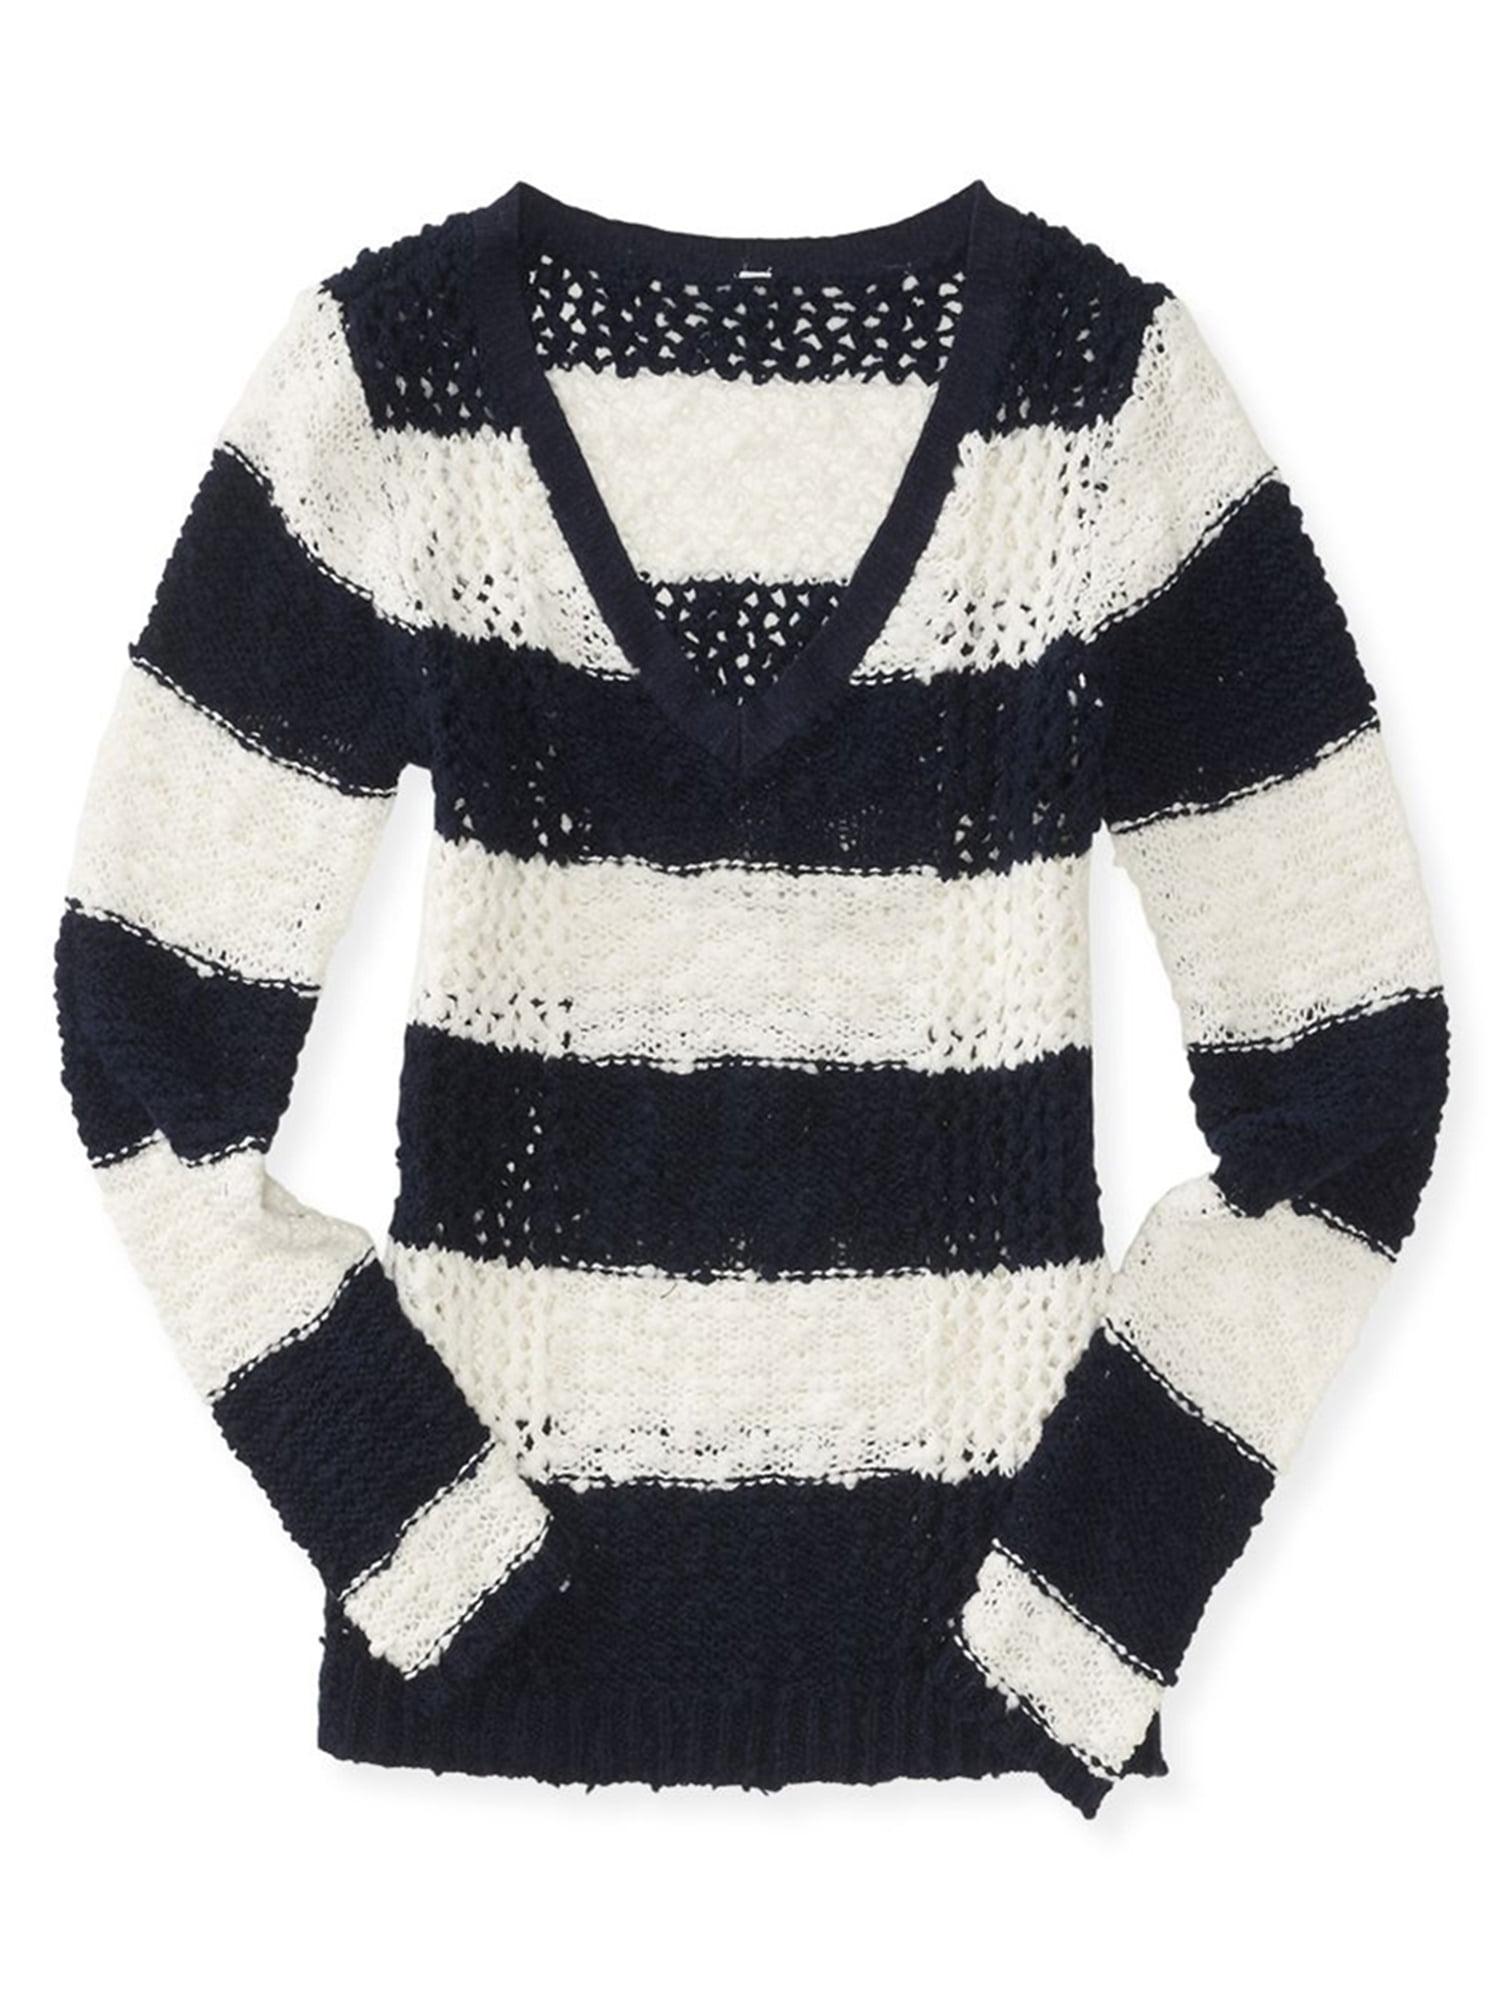 f6fdd18718 Aeropostale Juniors Colorblock Knit Sweater 404 Xs - Juniors